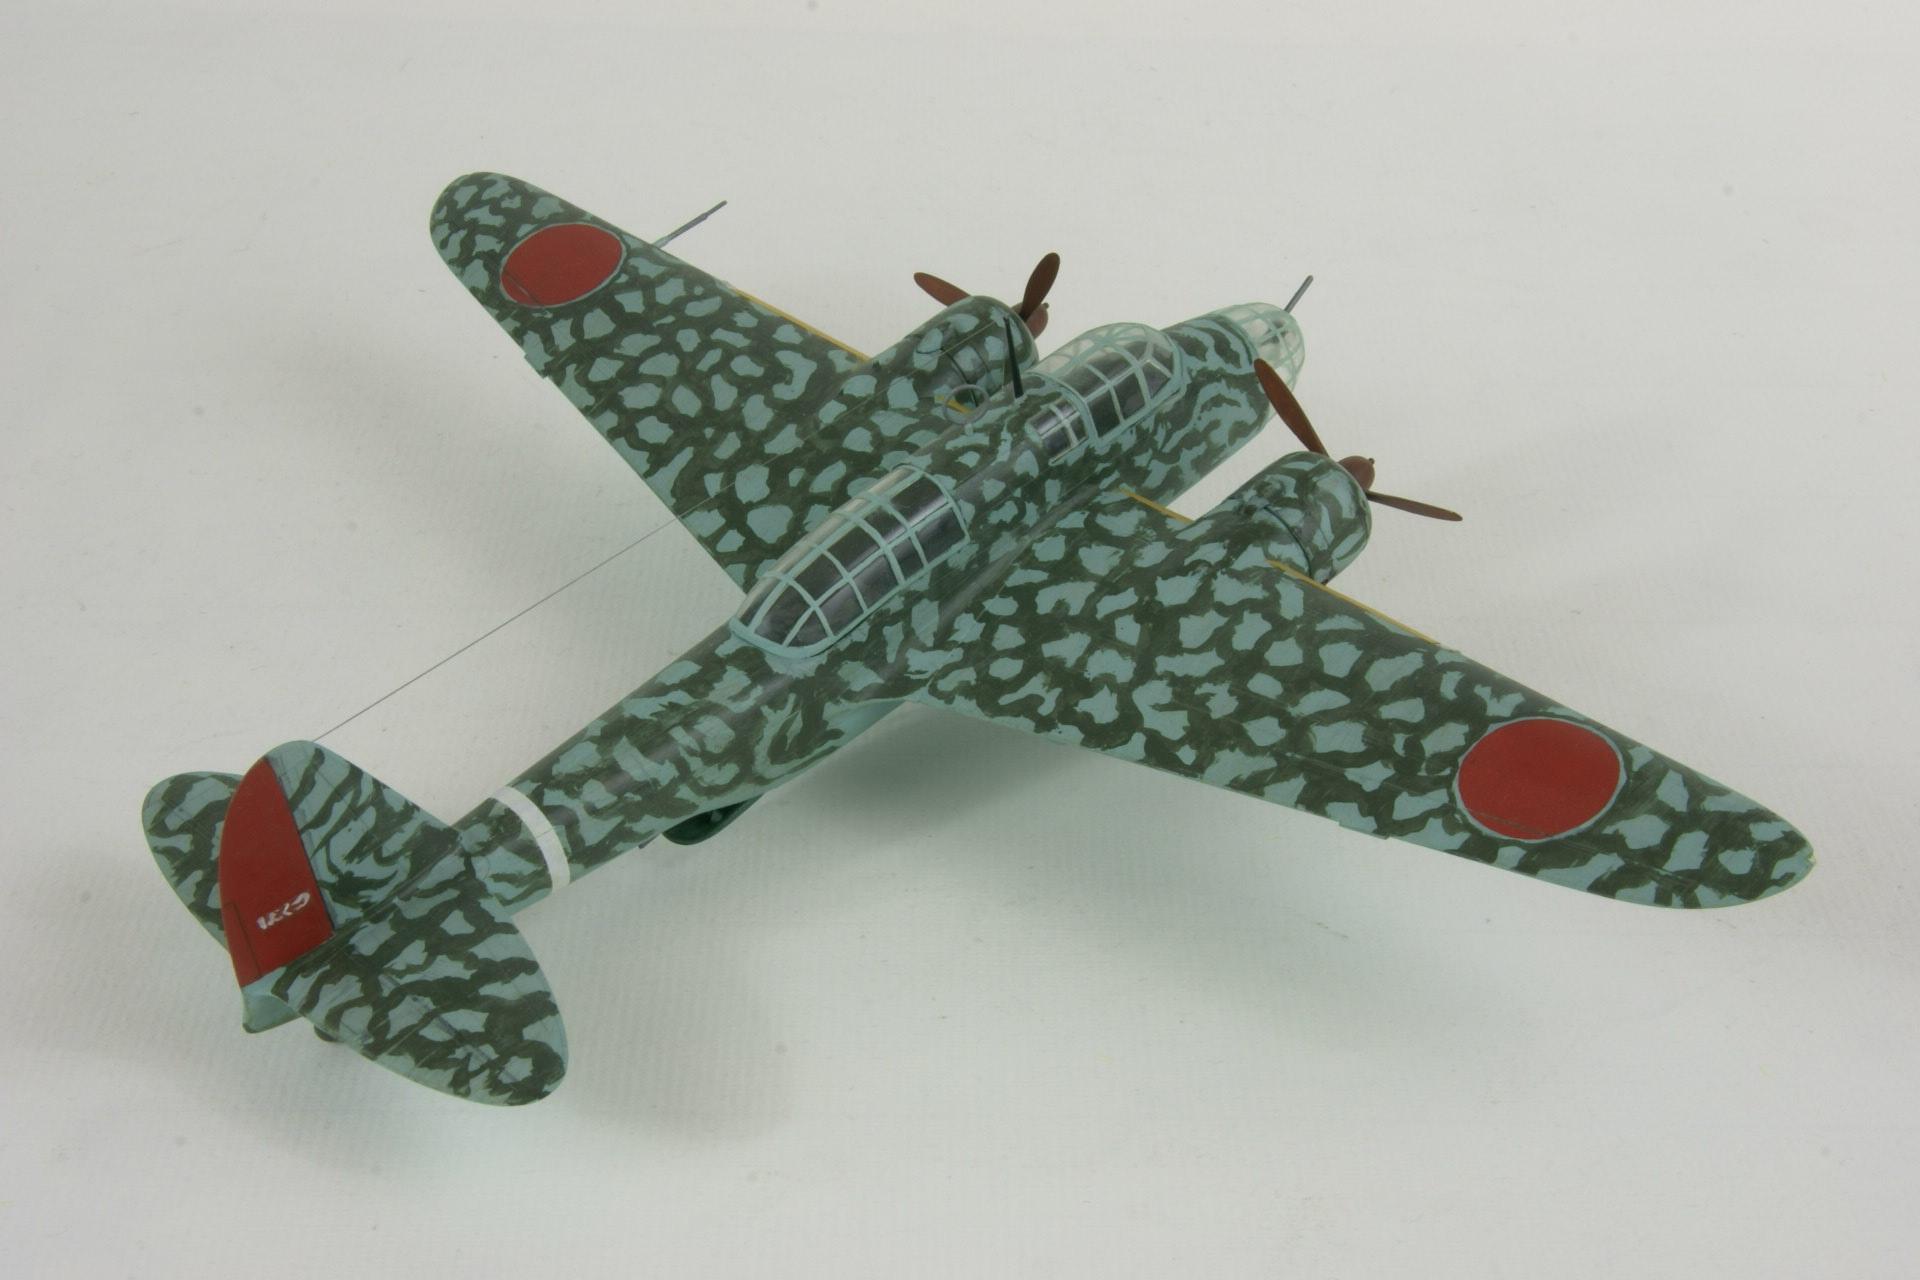 Kawasaki ki 48 ib lily 3 1